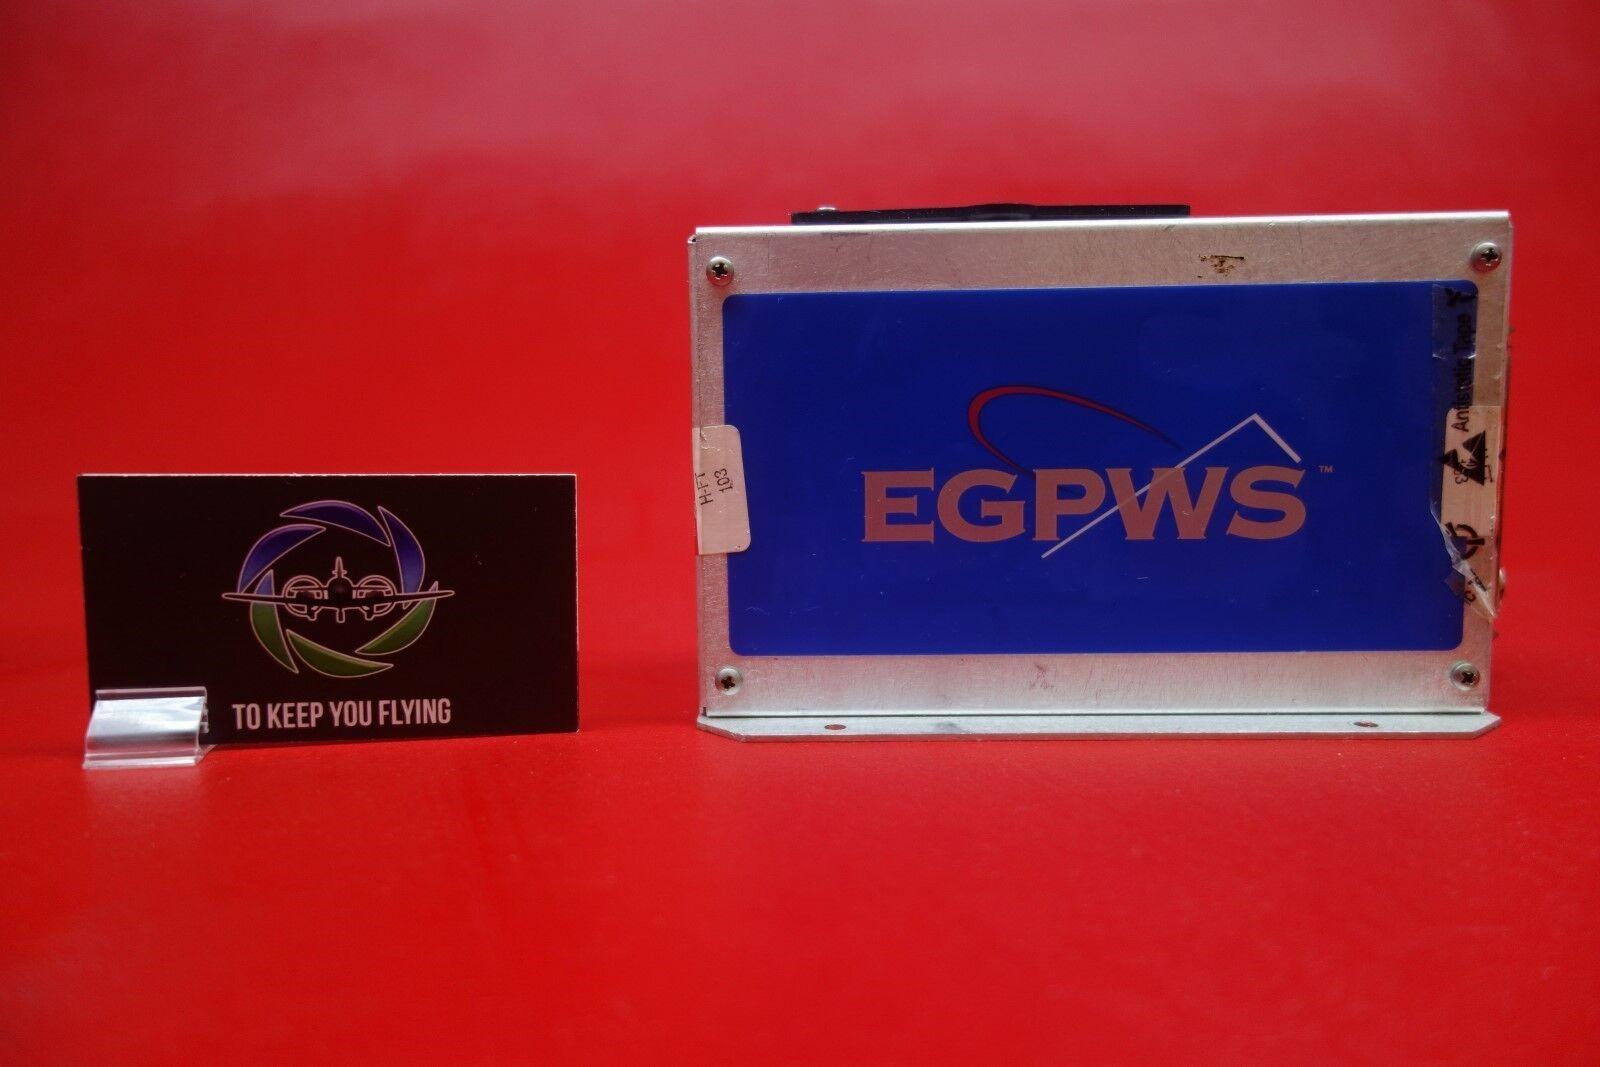 Bendix King, Honeywell KGP 860 GPS Antenna GA-EGPWS Computer PN 965-1199-005